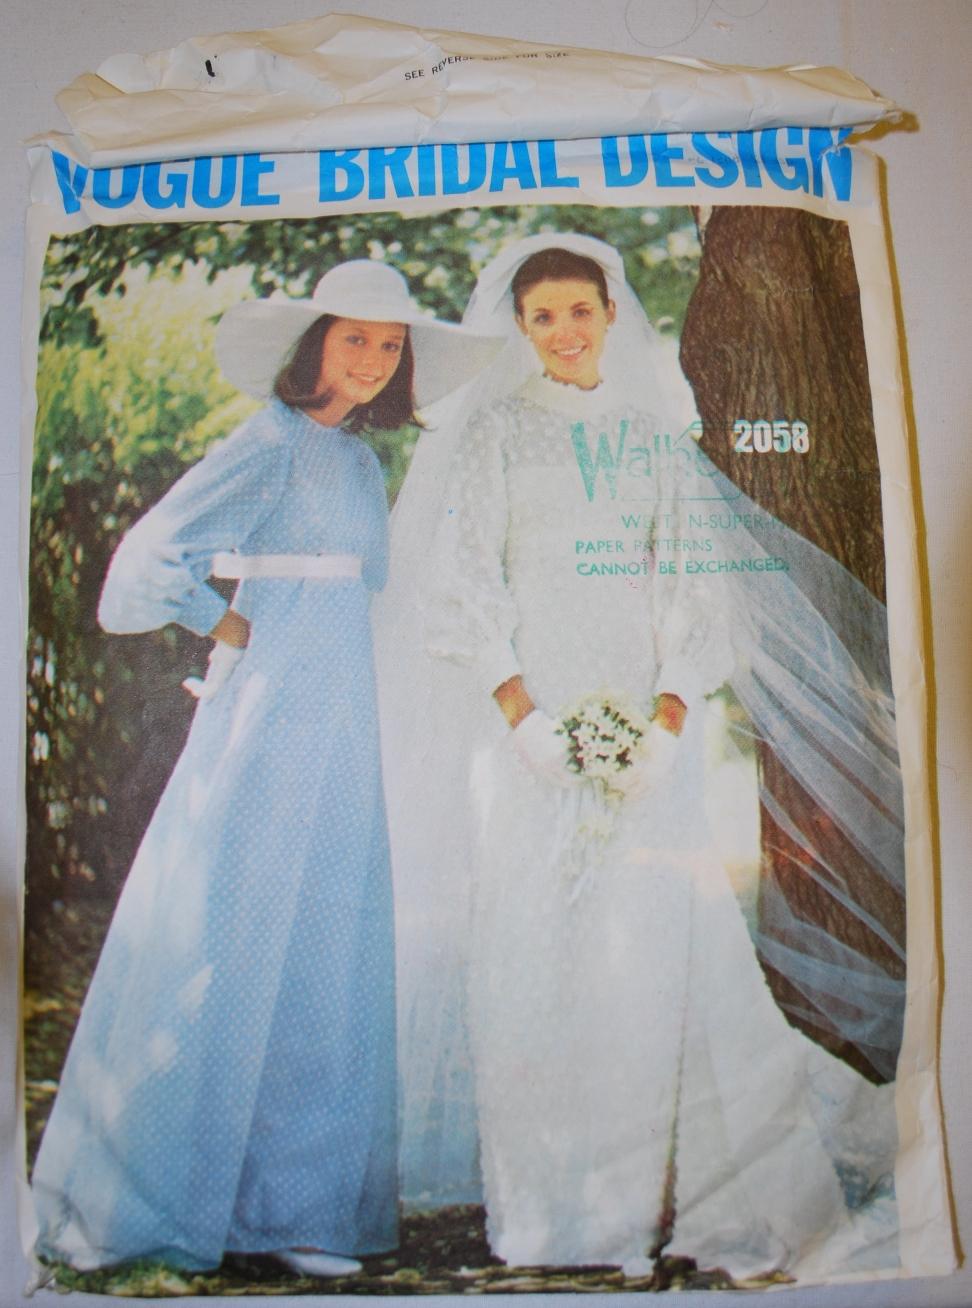 1960s Vogue bridal design